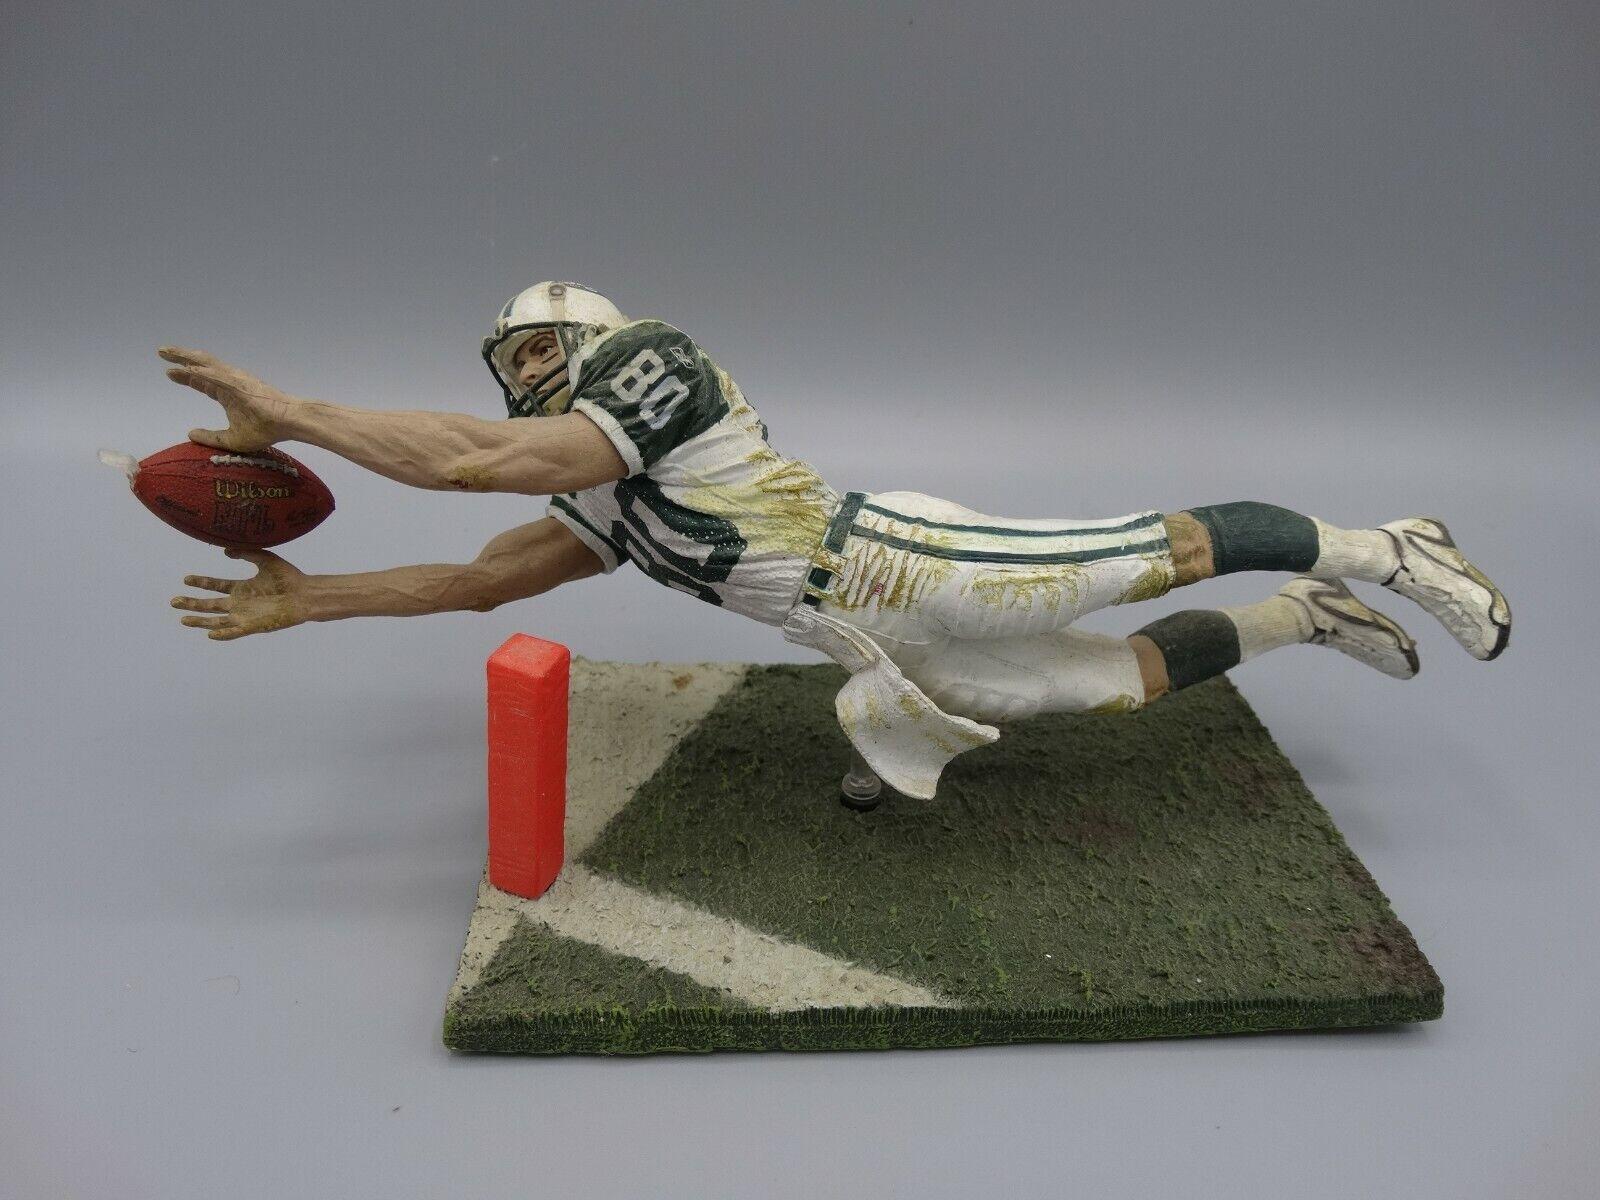 McFarlane NFL Wayne Chrebet WR ( New York Jets ) NFL